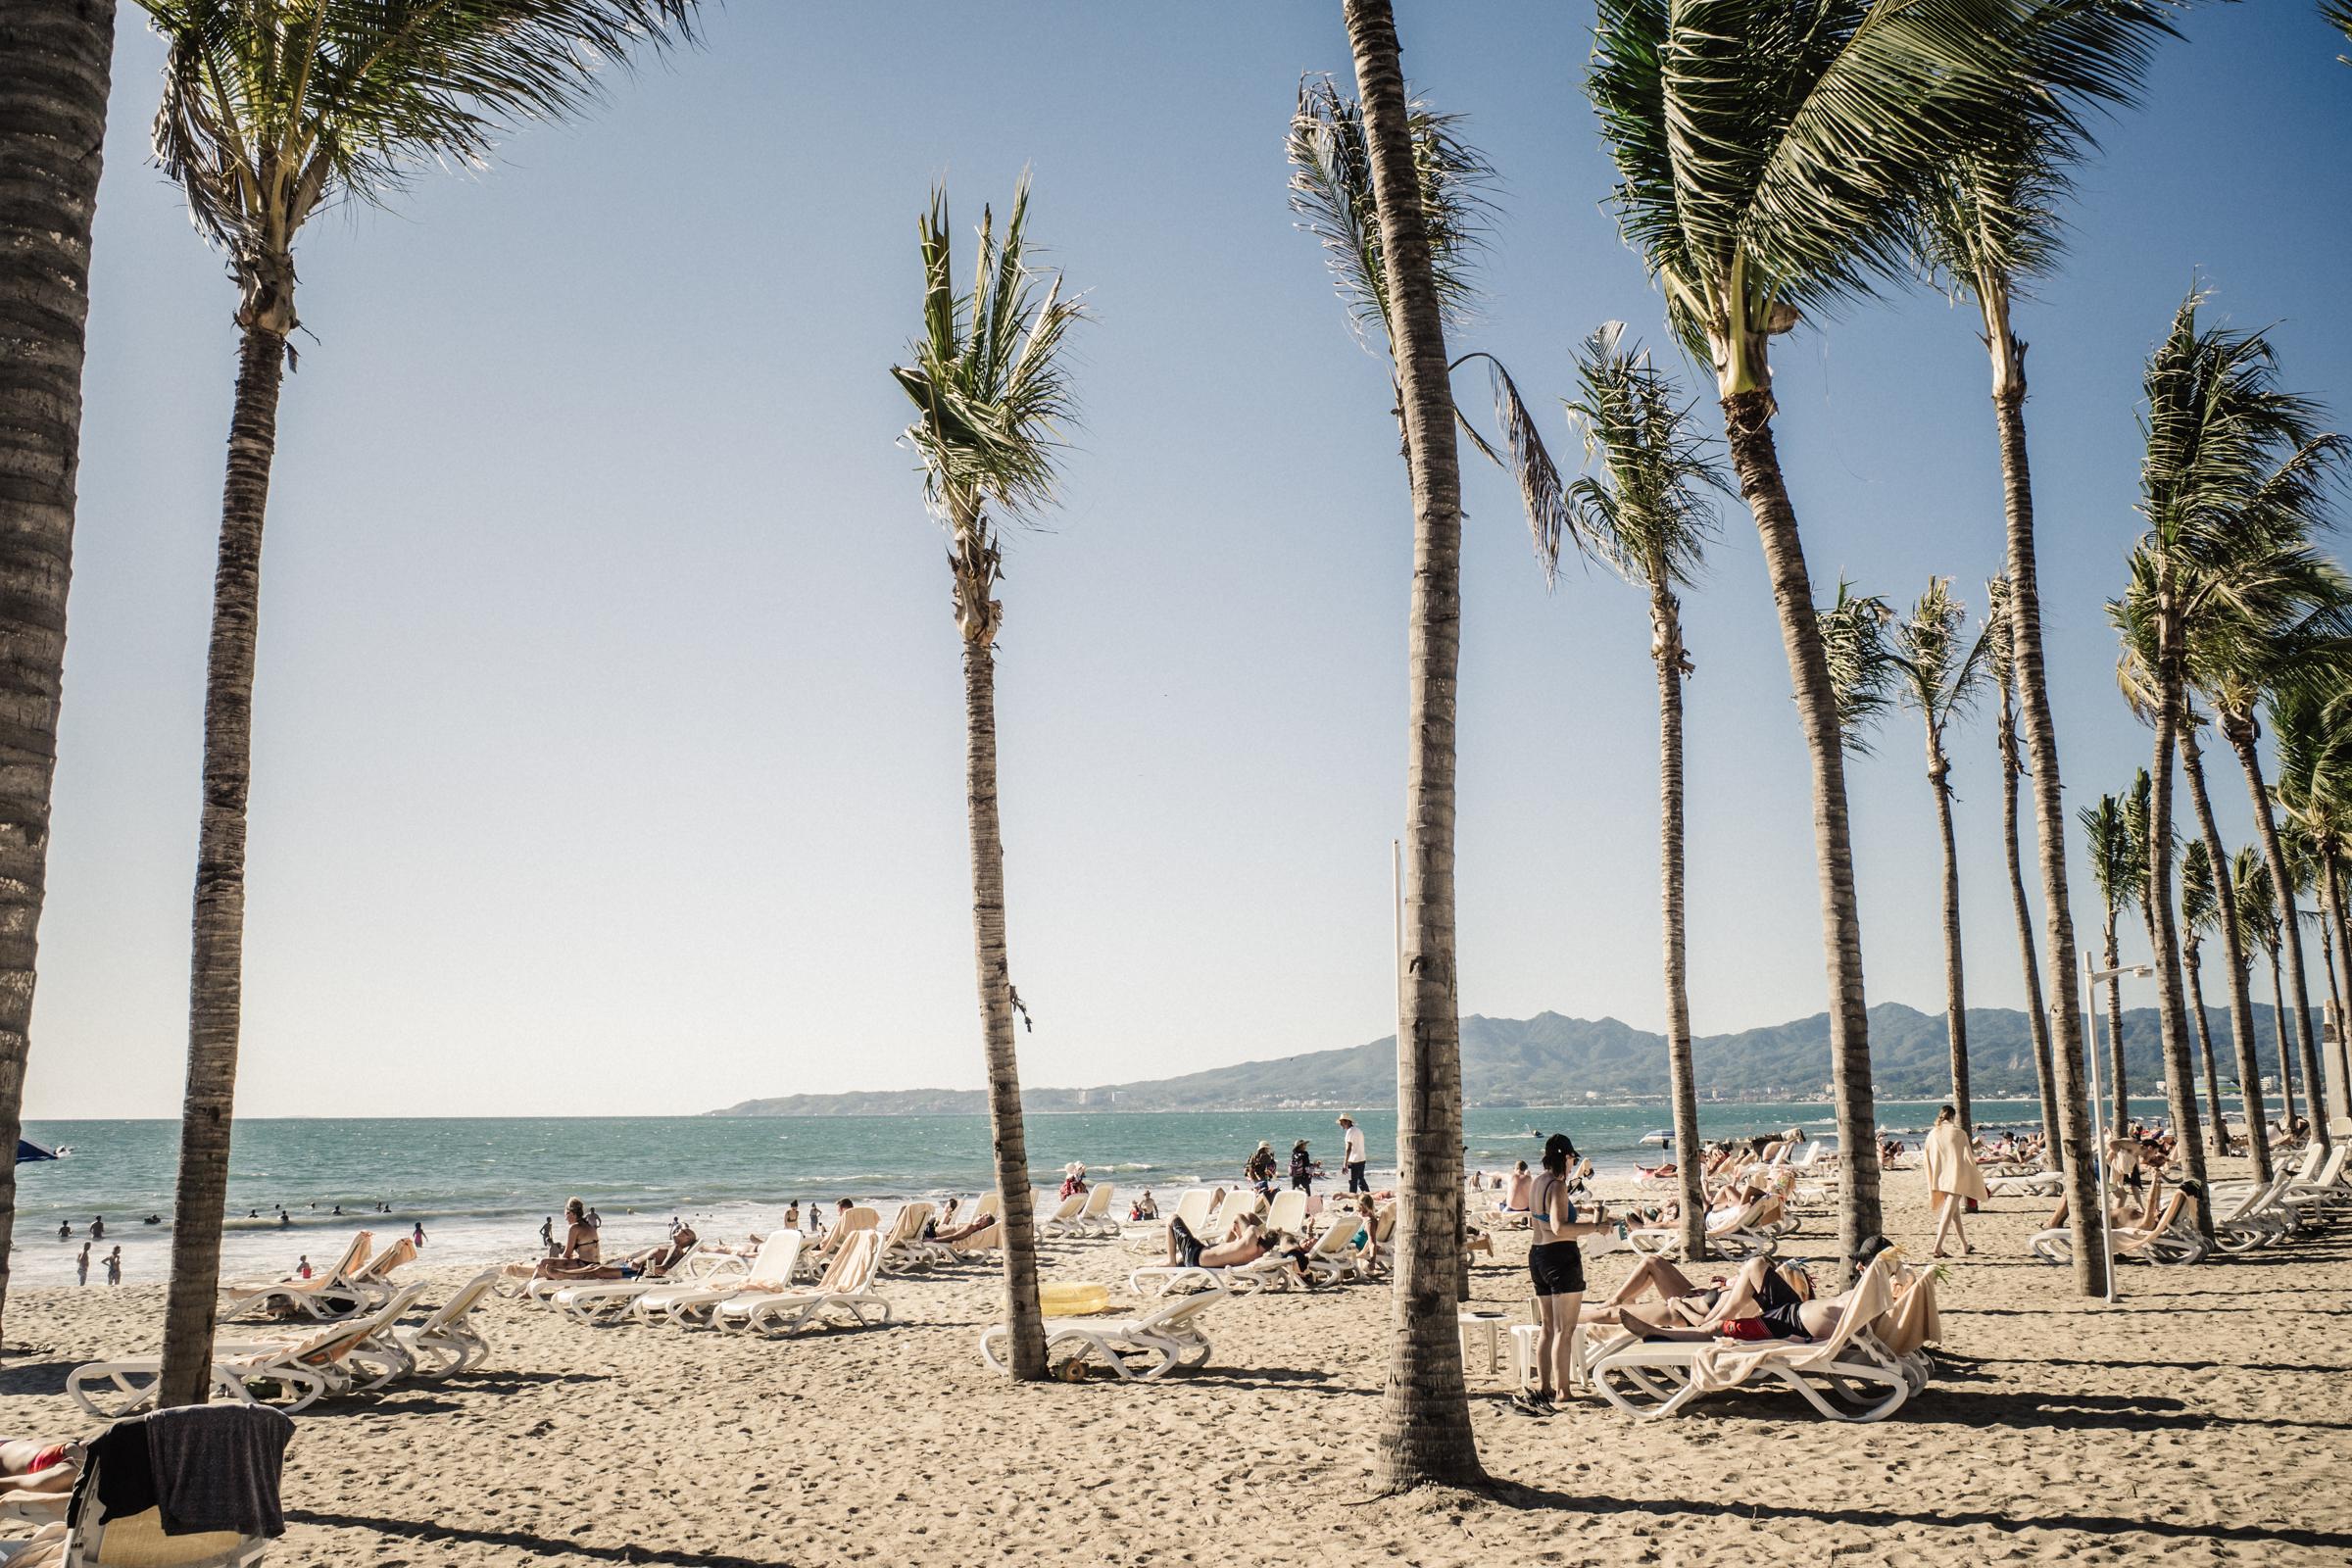 Puerto Vallarta beach in Mexico